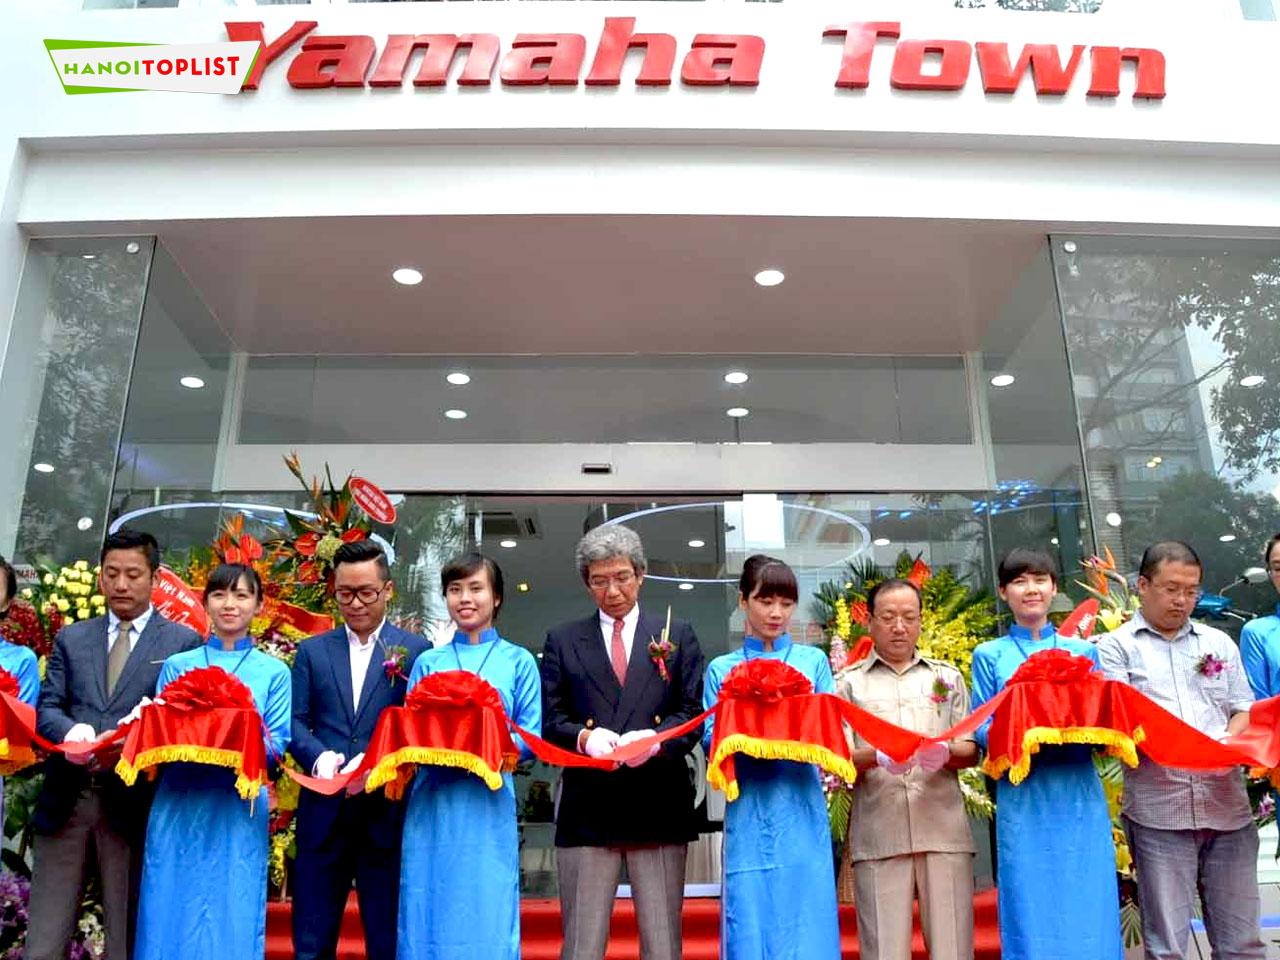 yamaha-town-ha-noi-1